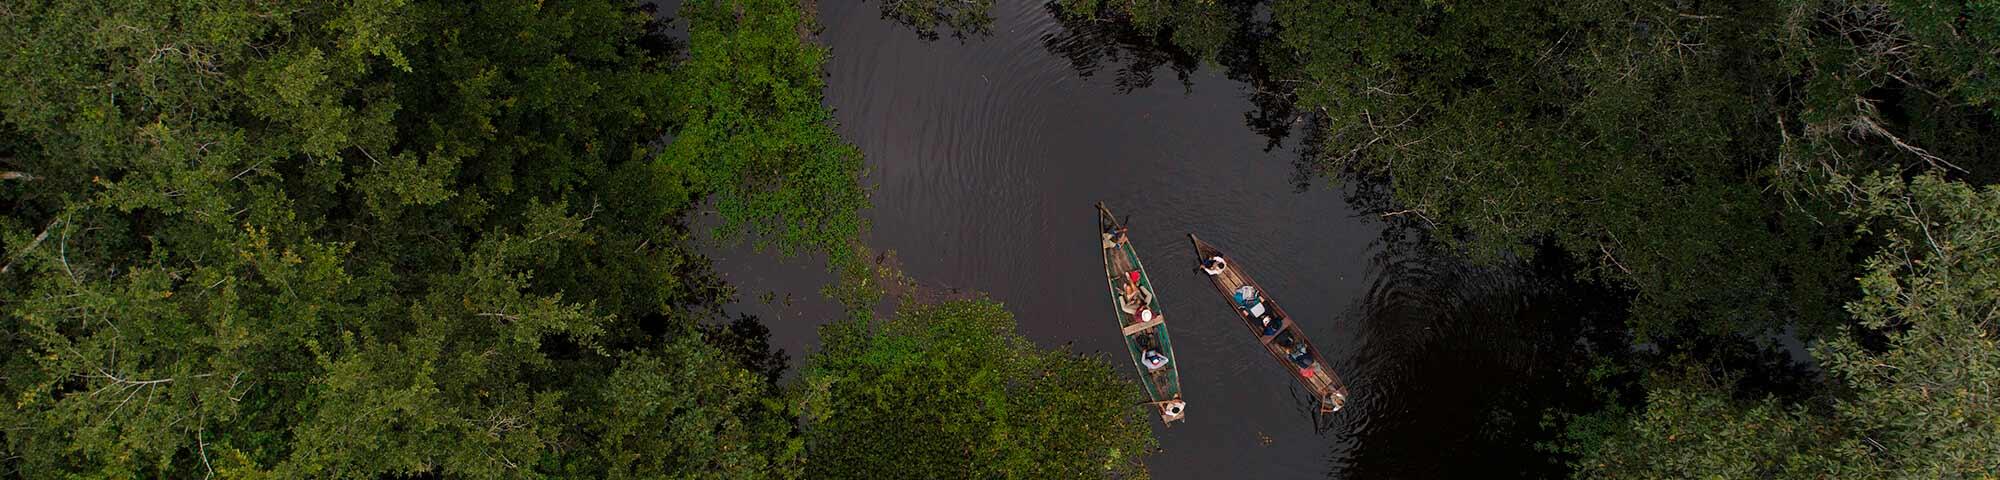 Reserva ecológica Tingana